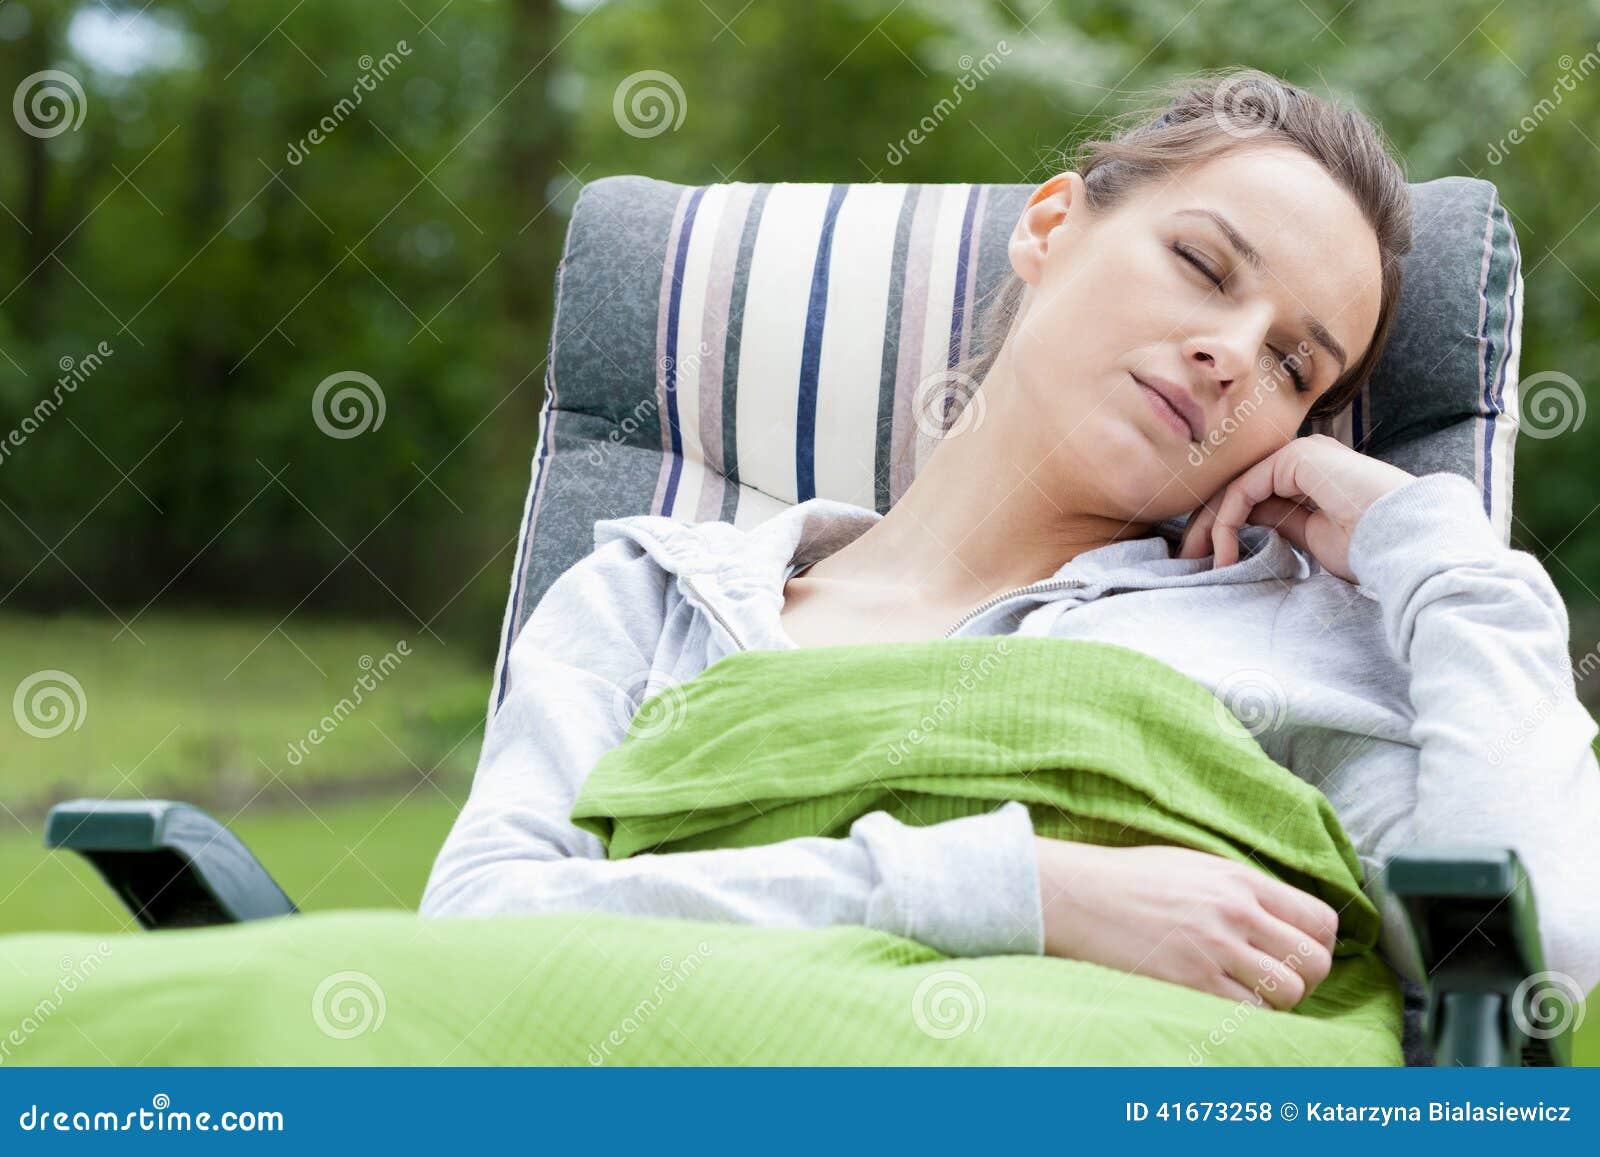 Woman sleeping in a garden